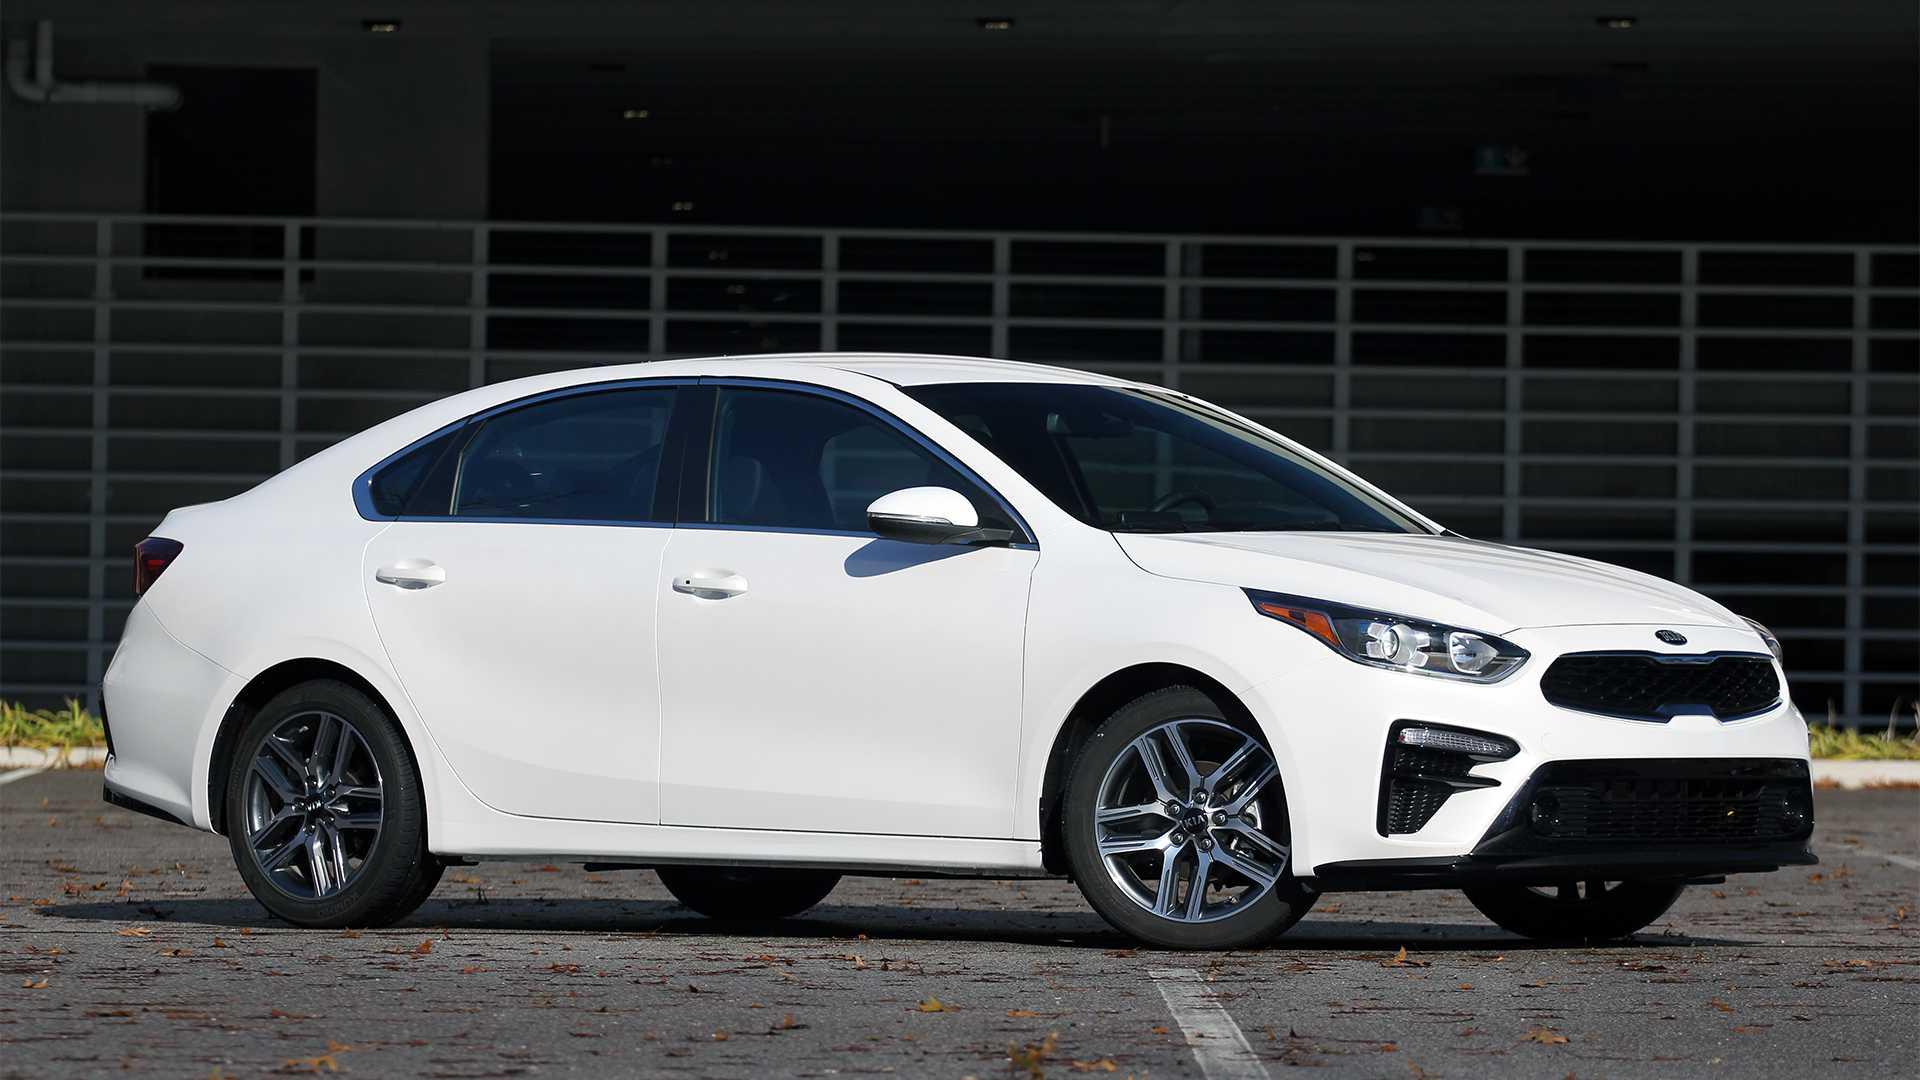 39 All New Kia Forte 2019 White Spesification First Drive by Kia Forte 2019 White Spesification